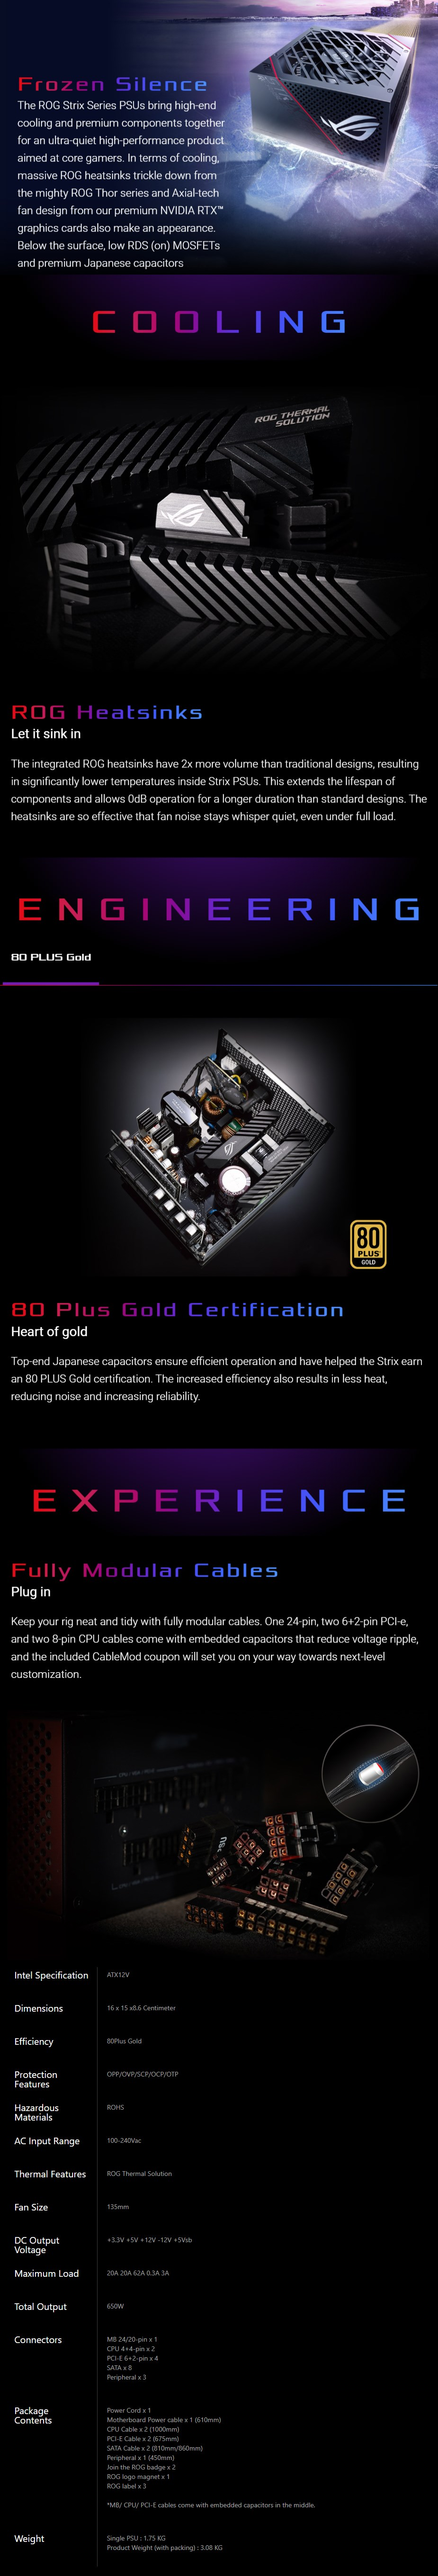 ASUS ROG Strix 650W 80 Plus Gold Modular Power Supply Unit - Overview 1